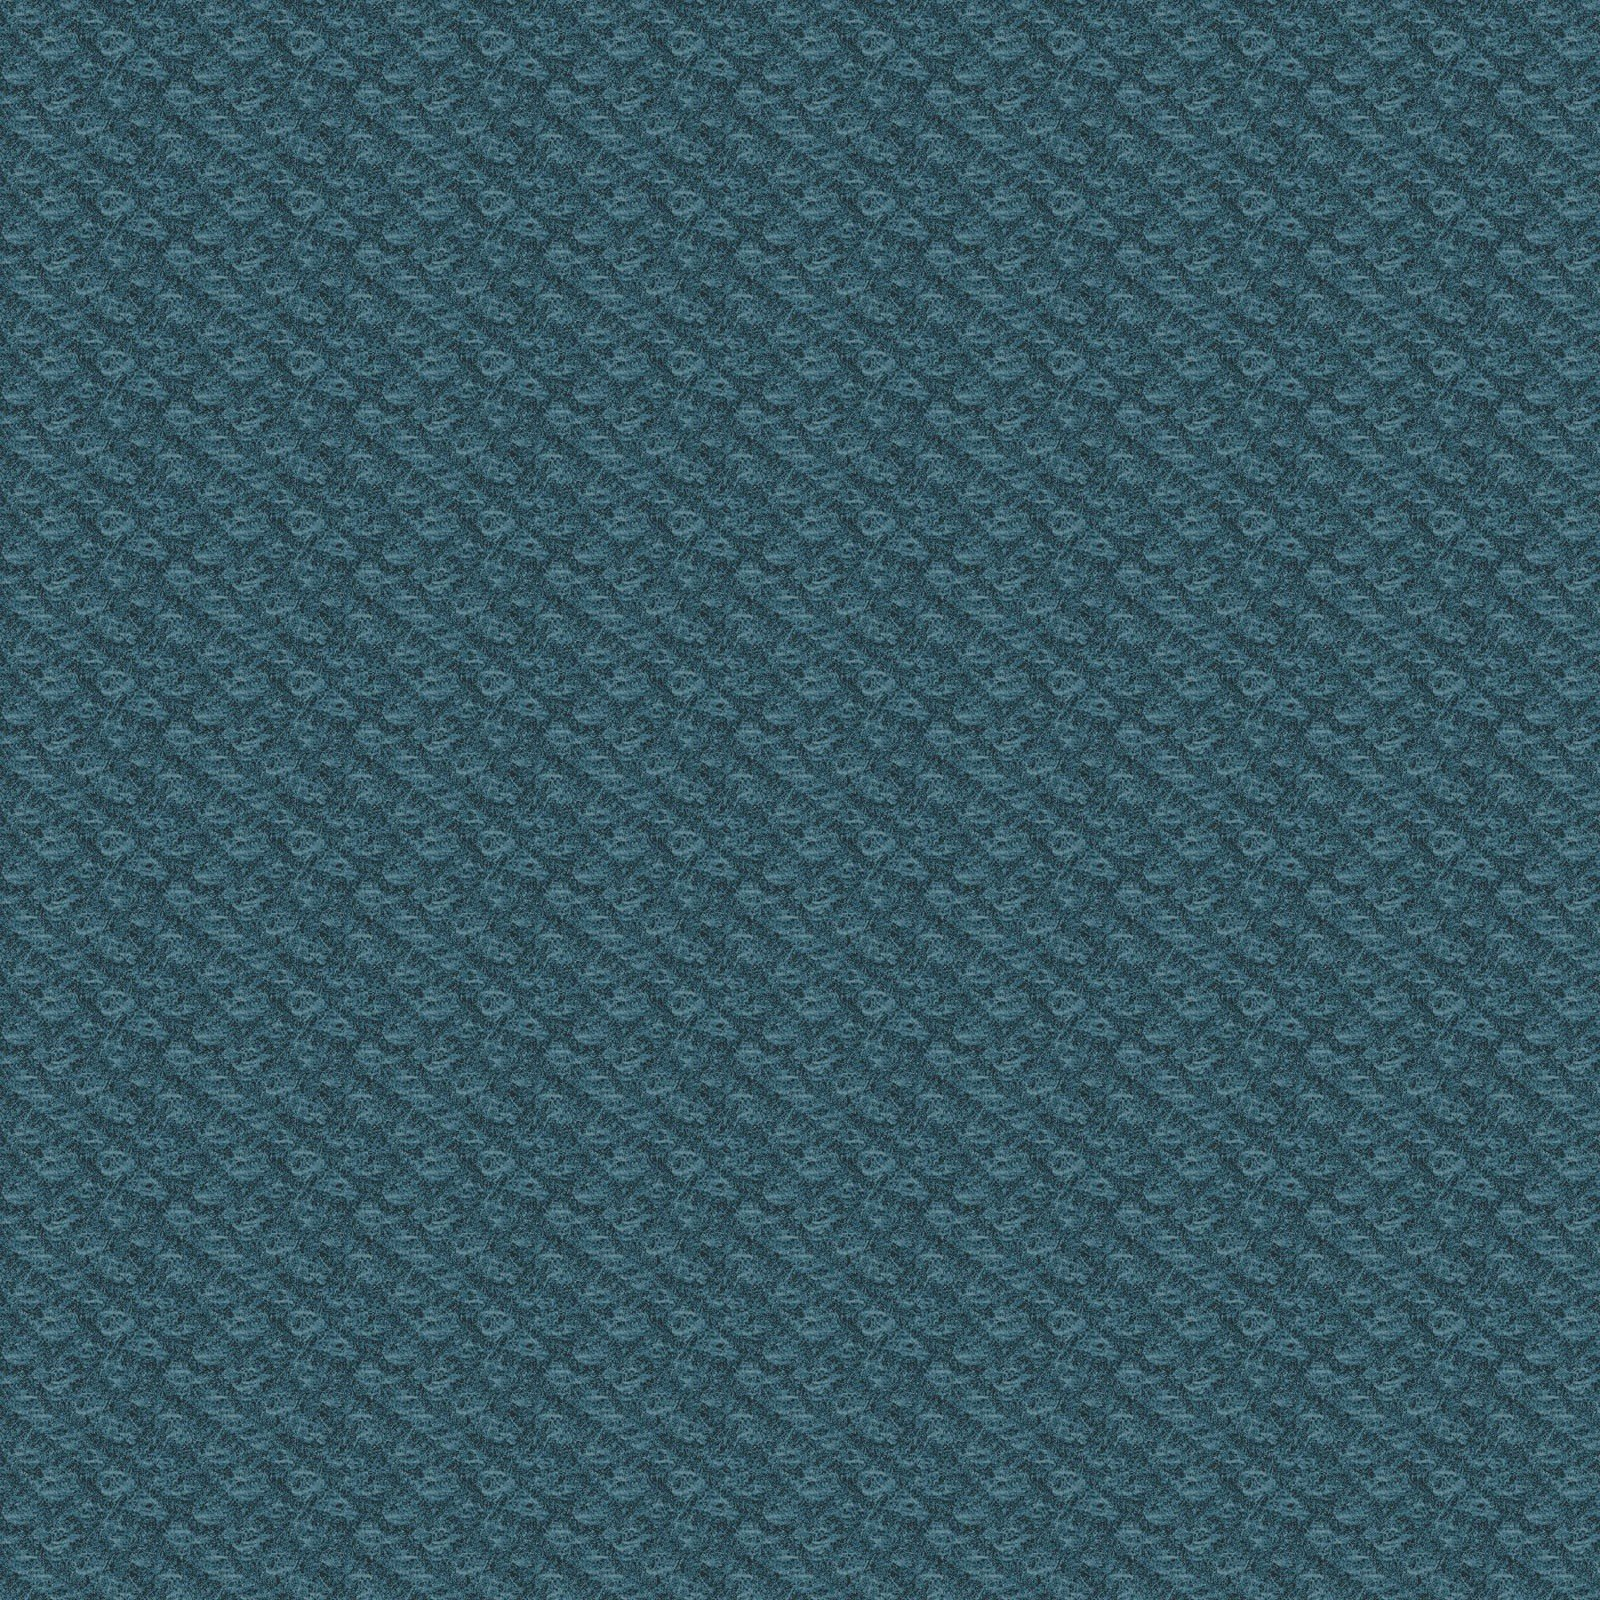 Woolies MASF18505-BG